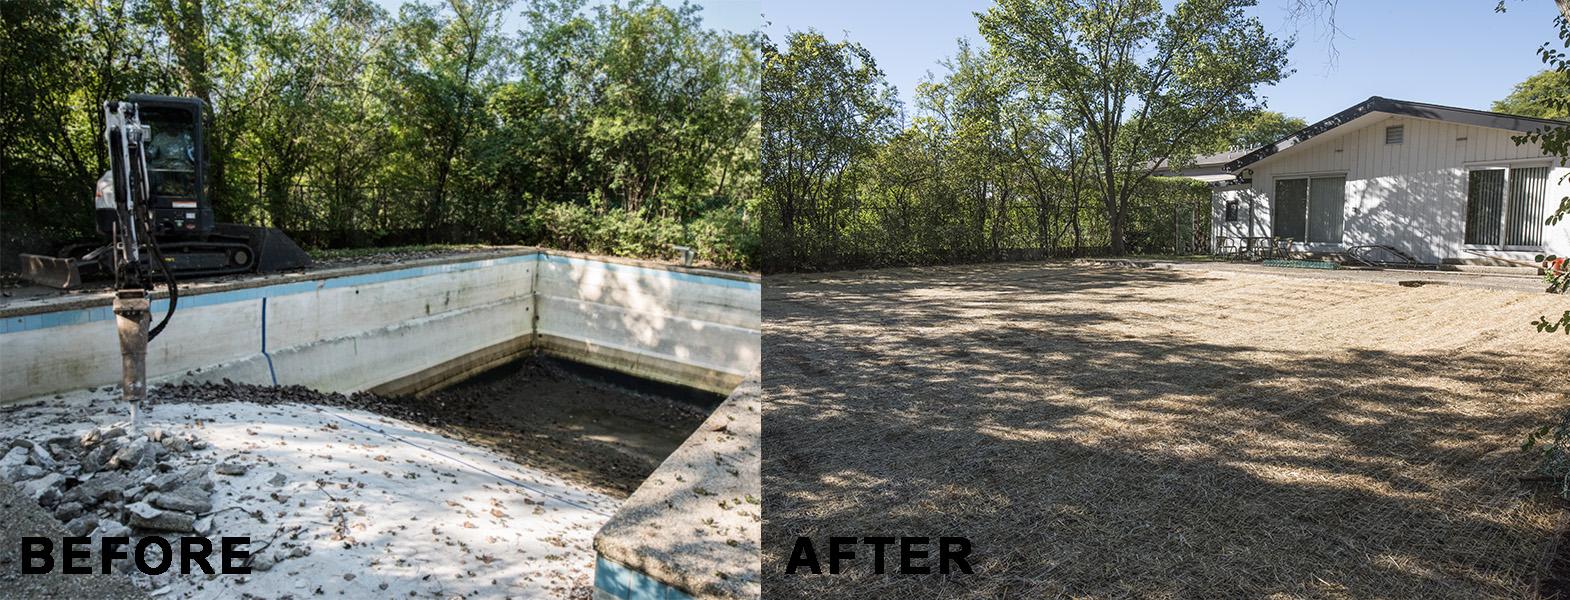 Mack Land LLC - Highland Park, IL Pool Removal